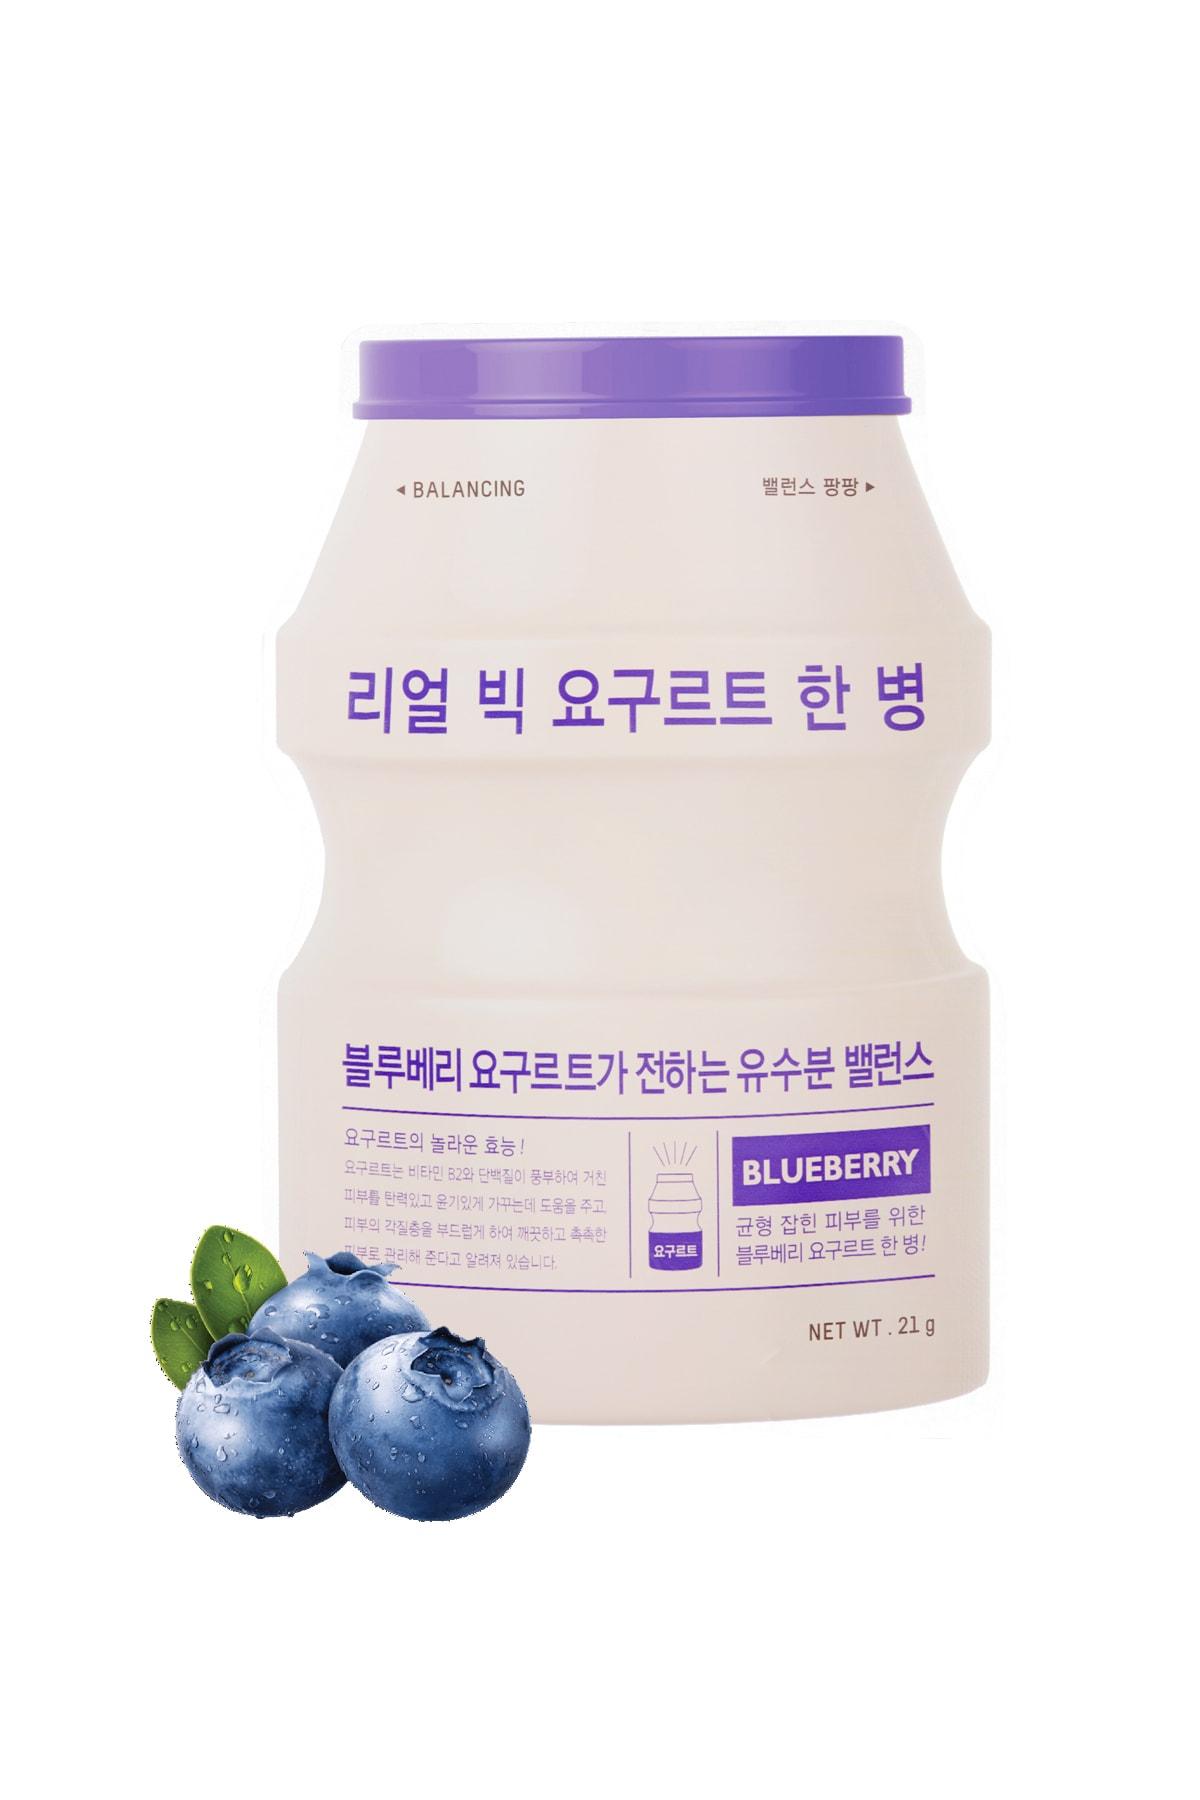 Missha Yağlanma Karşıtı Yoğurtlu Maske APIEU Real Big Yogurt One-Bottle (Blueberry)